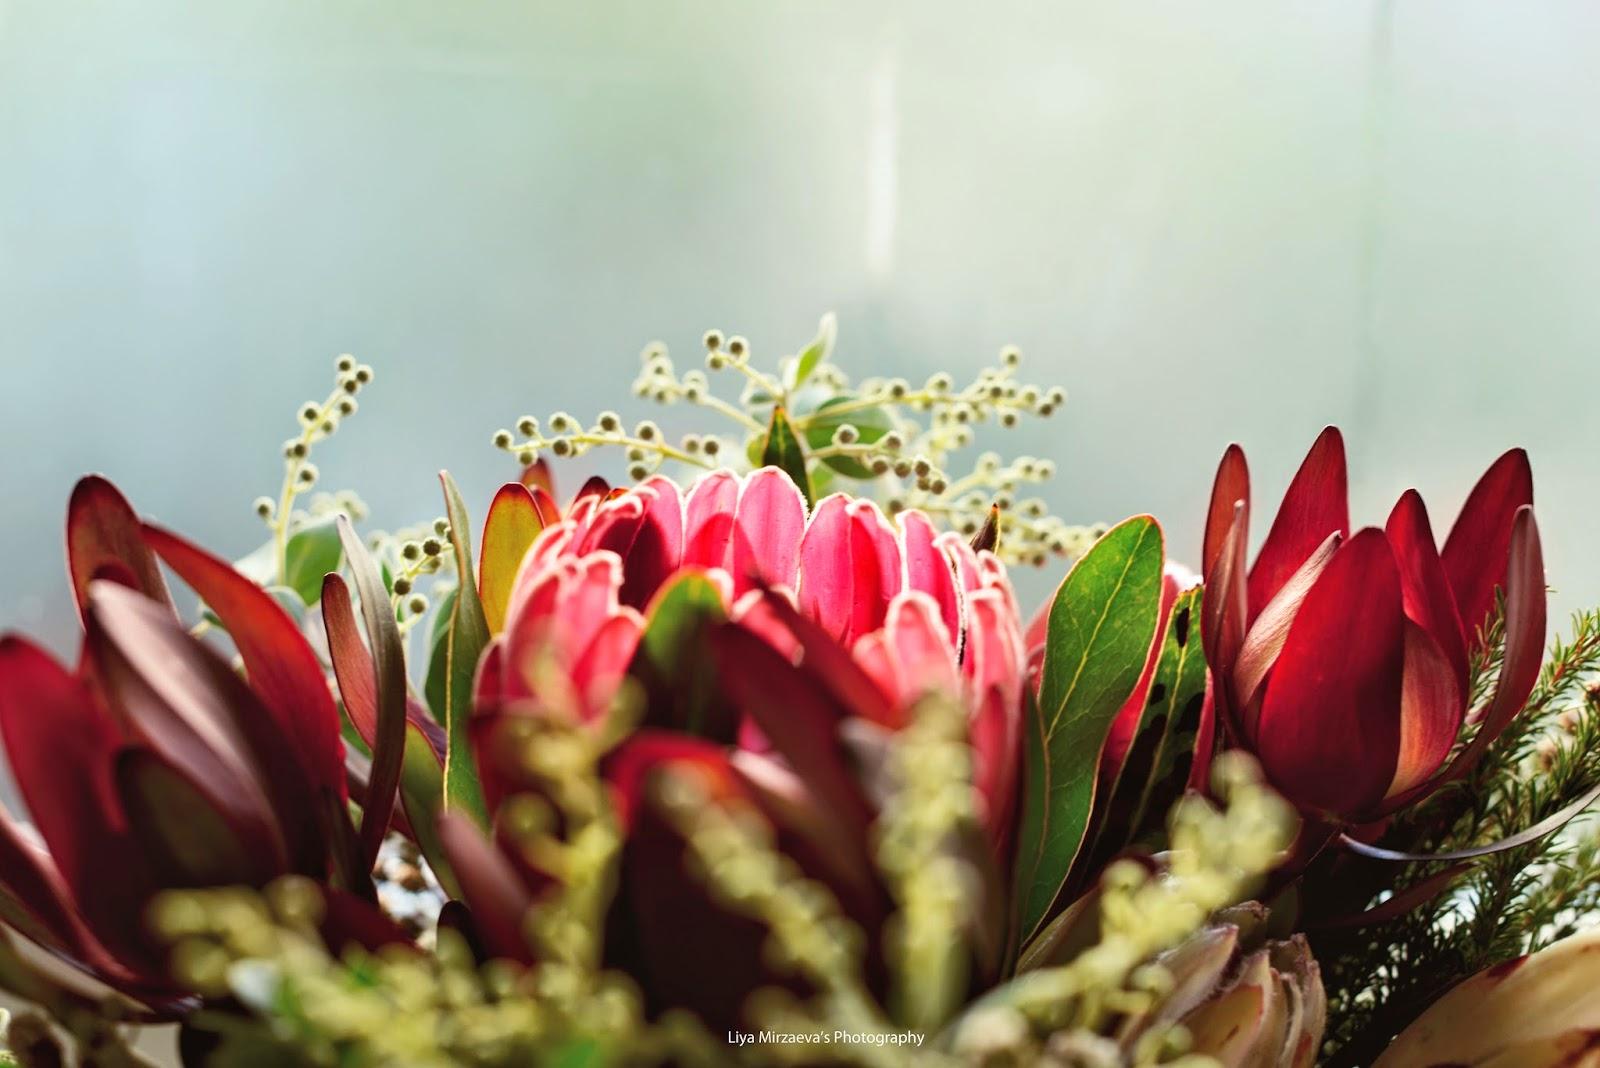 Liya Mirzaeva, flowers, wild flowers, nature, home, lifestyle, happy, native australian flowers